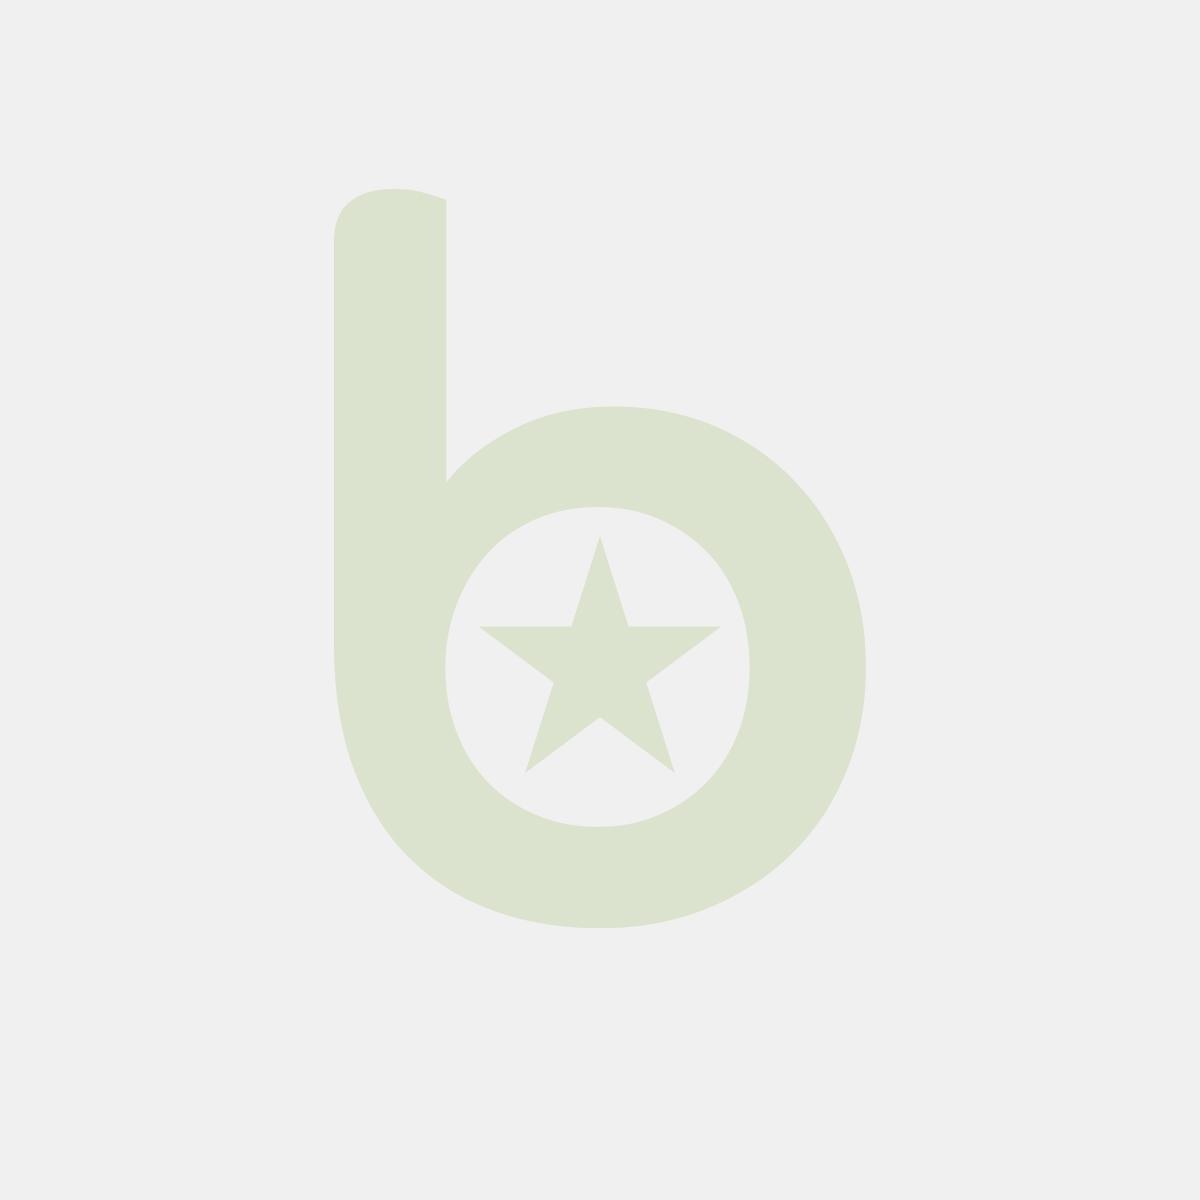 Bieżnik PAPSTAR Royal Collection w rolce 24m/40cm Arabesque bibuła